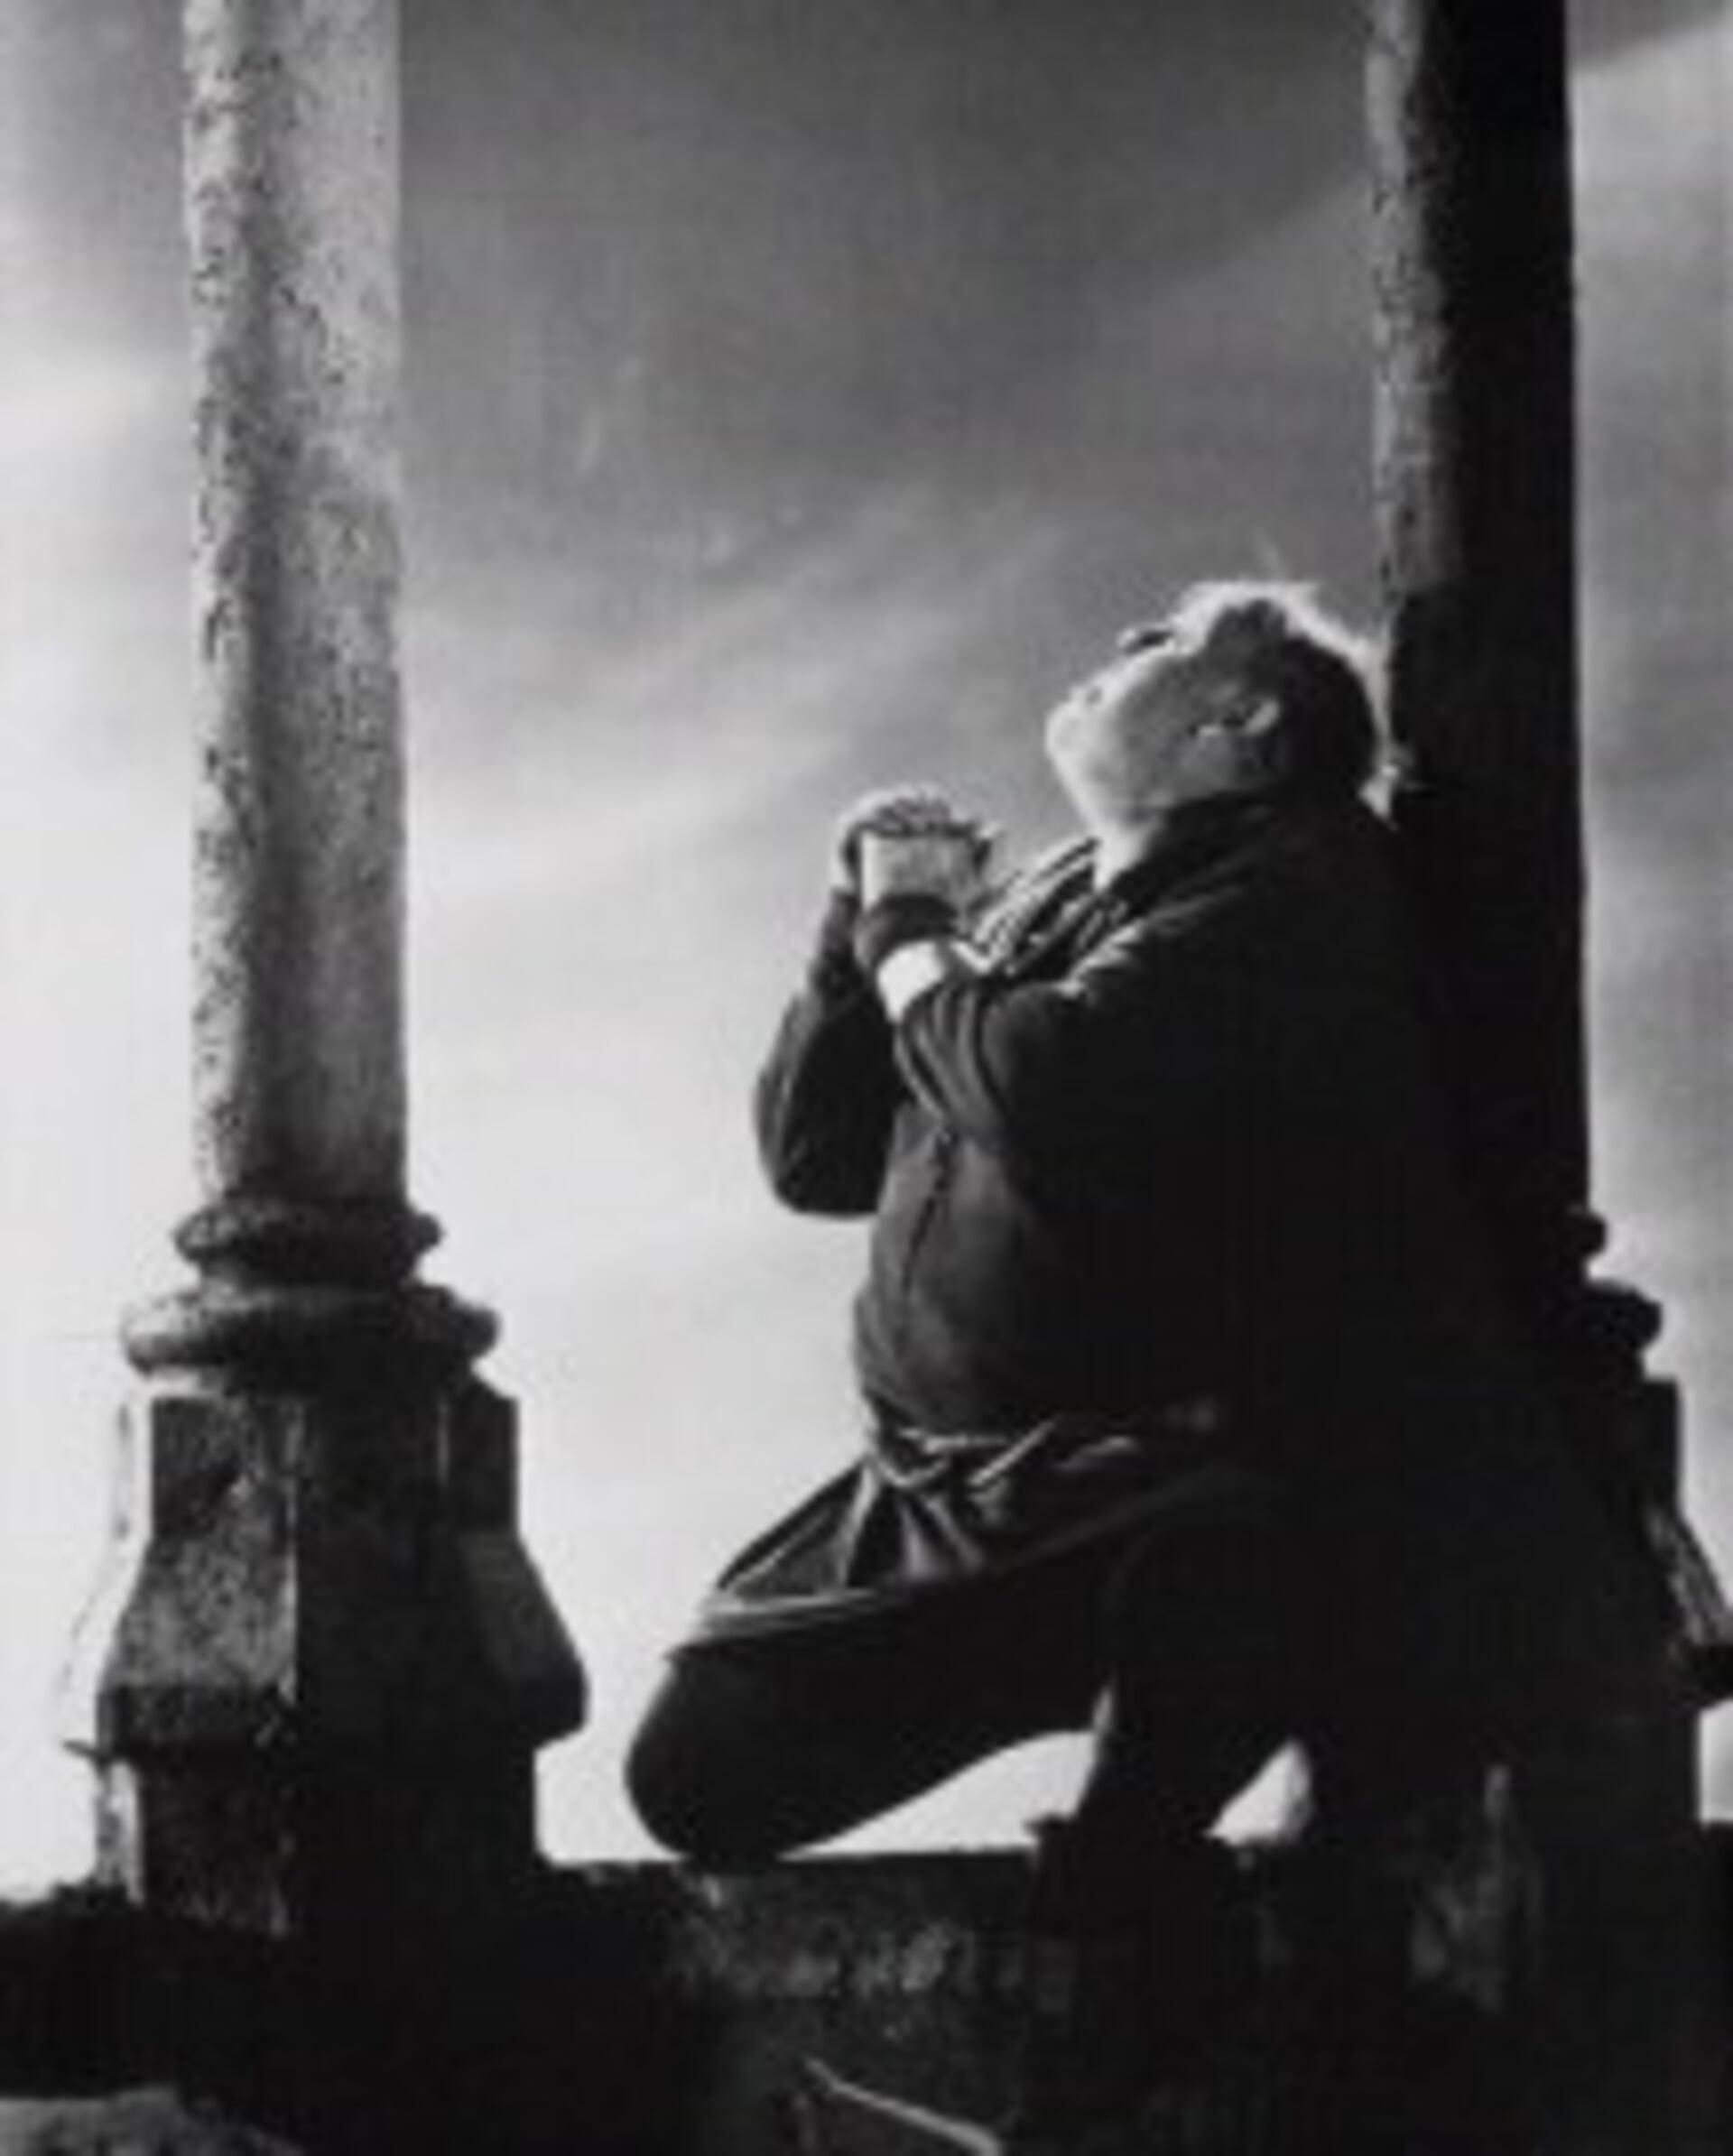 The Hunchback of Notre Dame - Image 5